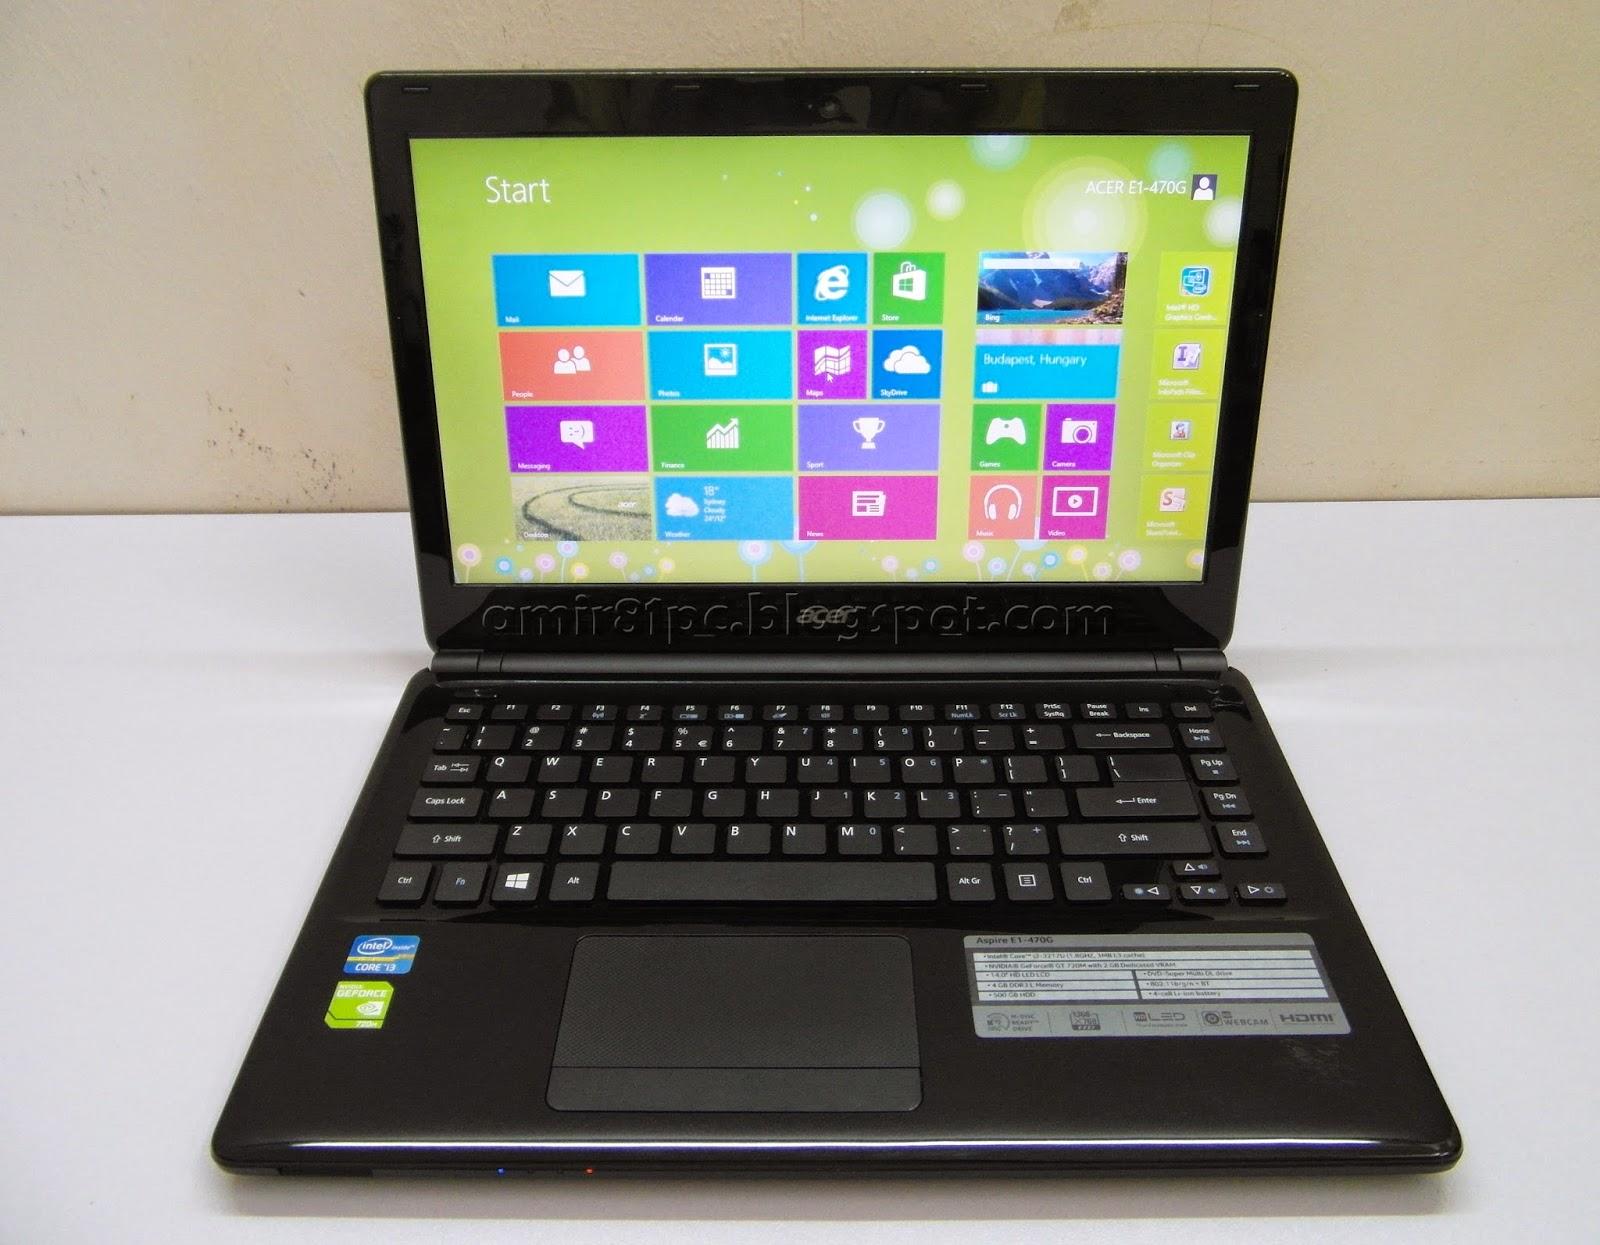 Used Laptop Acer Aspire E E1 470G 3rd Gen Core I3 2GB Nvidia GT720M Warranty Till DEC 2014 RM 1185